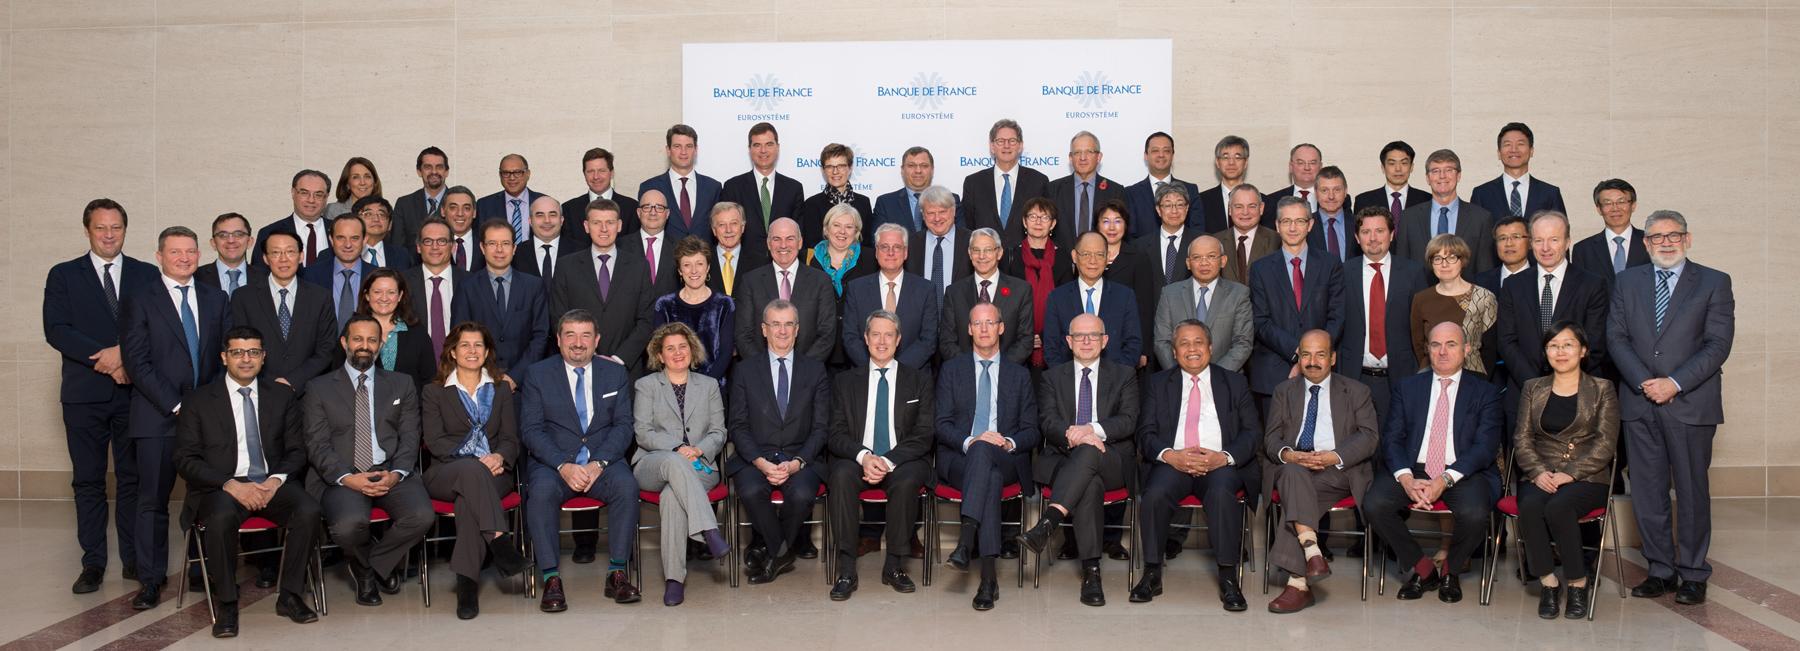 FSB Plenary Meeting, Paris 2019